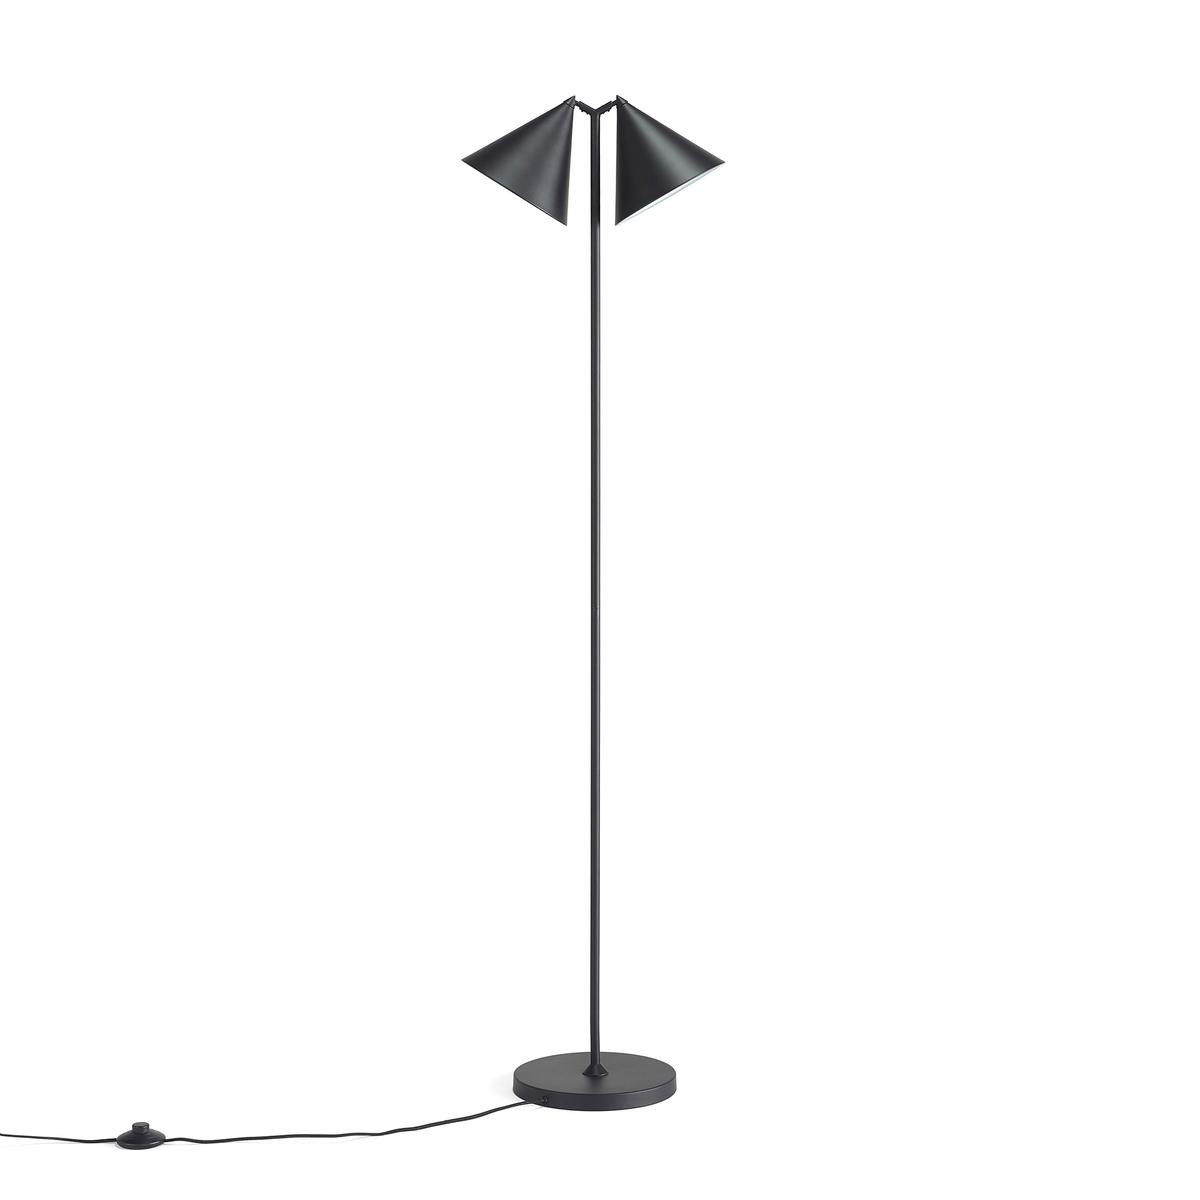 Moke Metal Floor Lamp